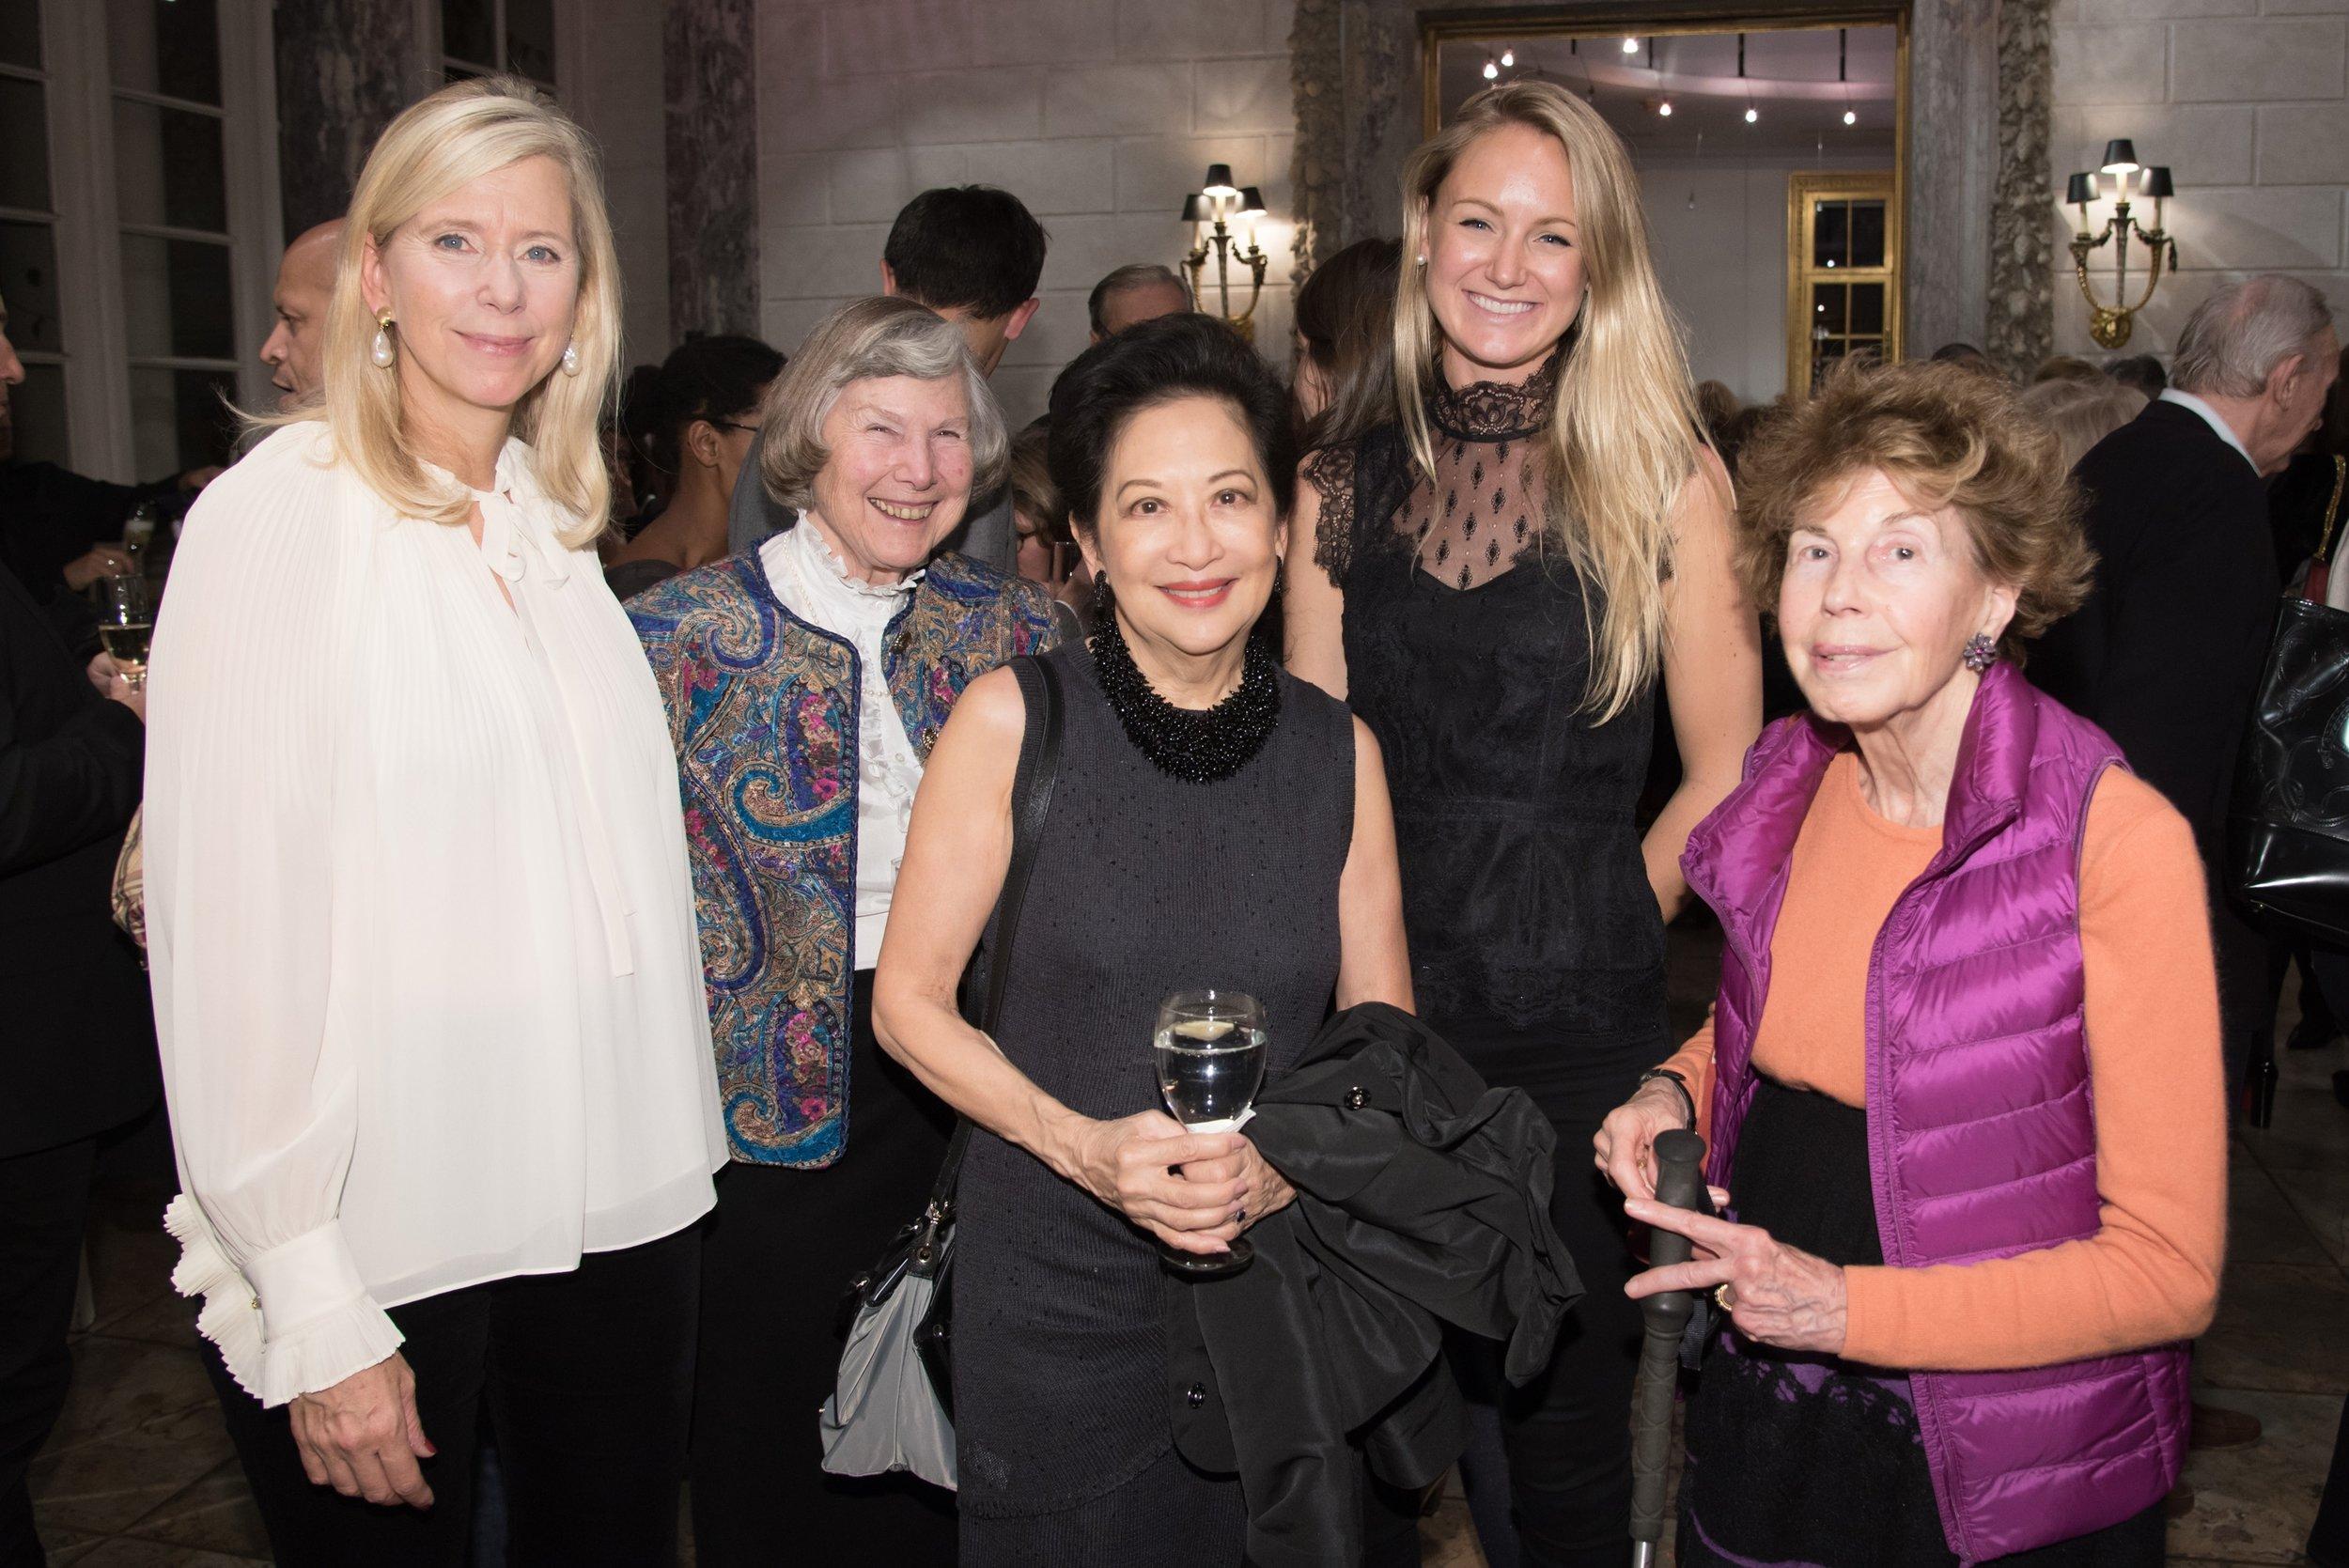 aw-59390-Dorothea De La Houssaye, Caroline Lareuse, Patricia Lee, Alexandra Beckmeyer, Eugenie Angles.jpg